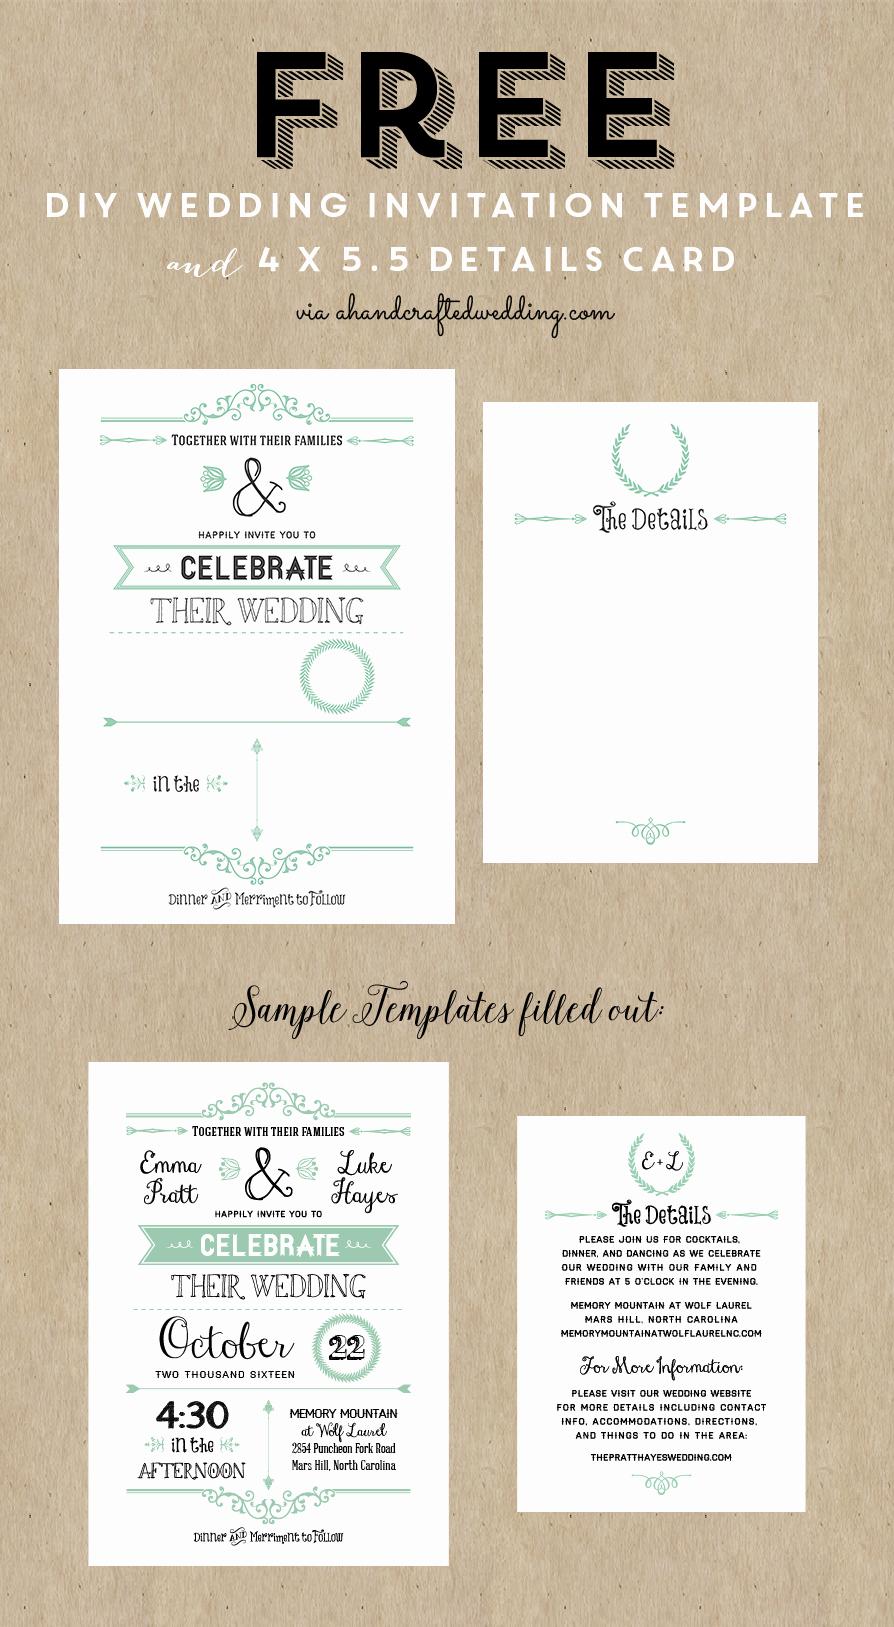 Wedding Invitation On Pinterest Best Of Best 25 Free Wedding Invitation Templates Ideas On